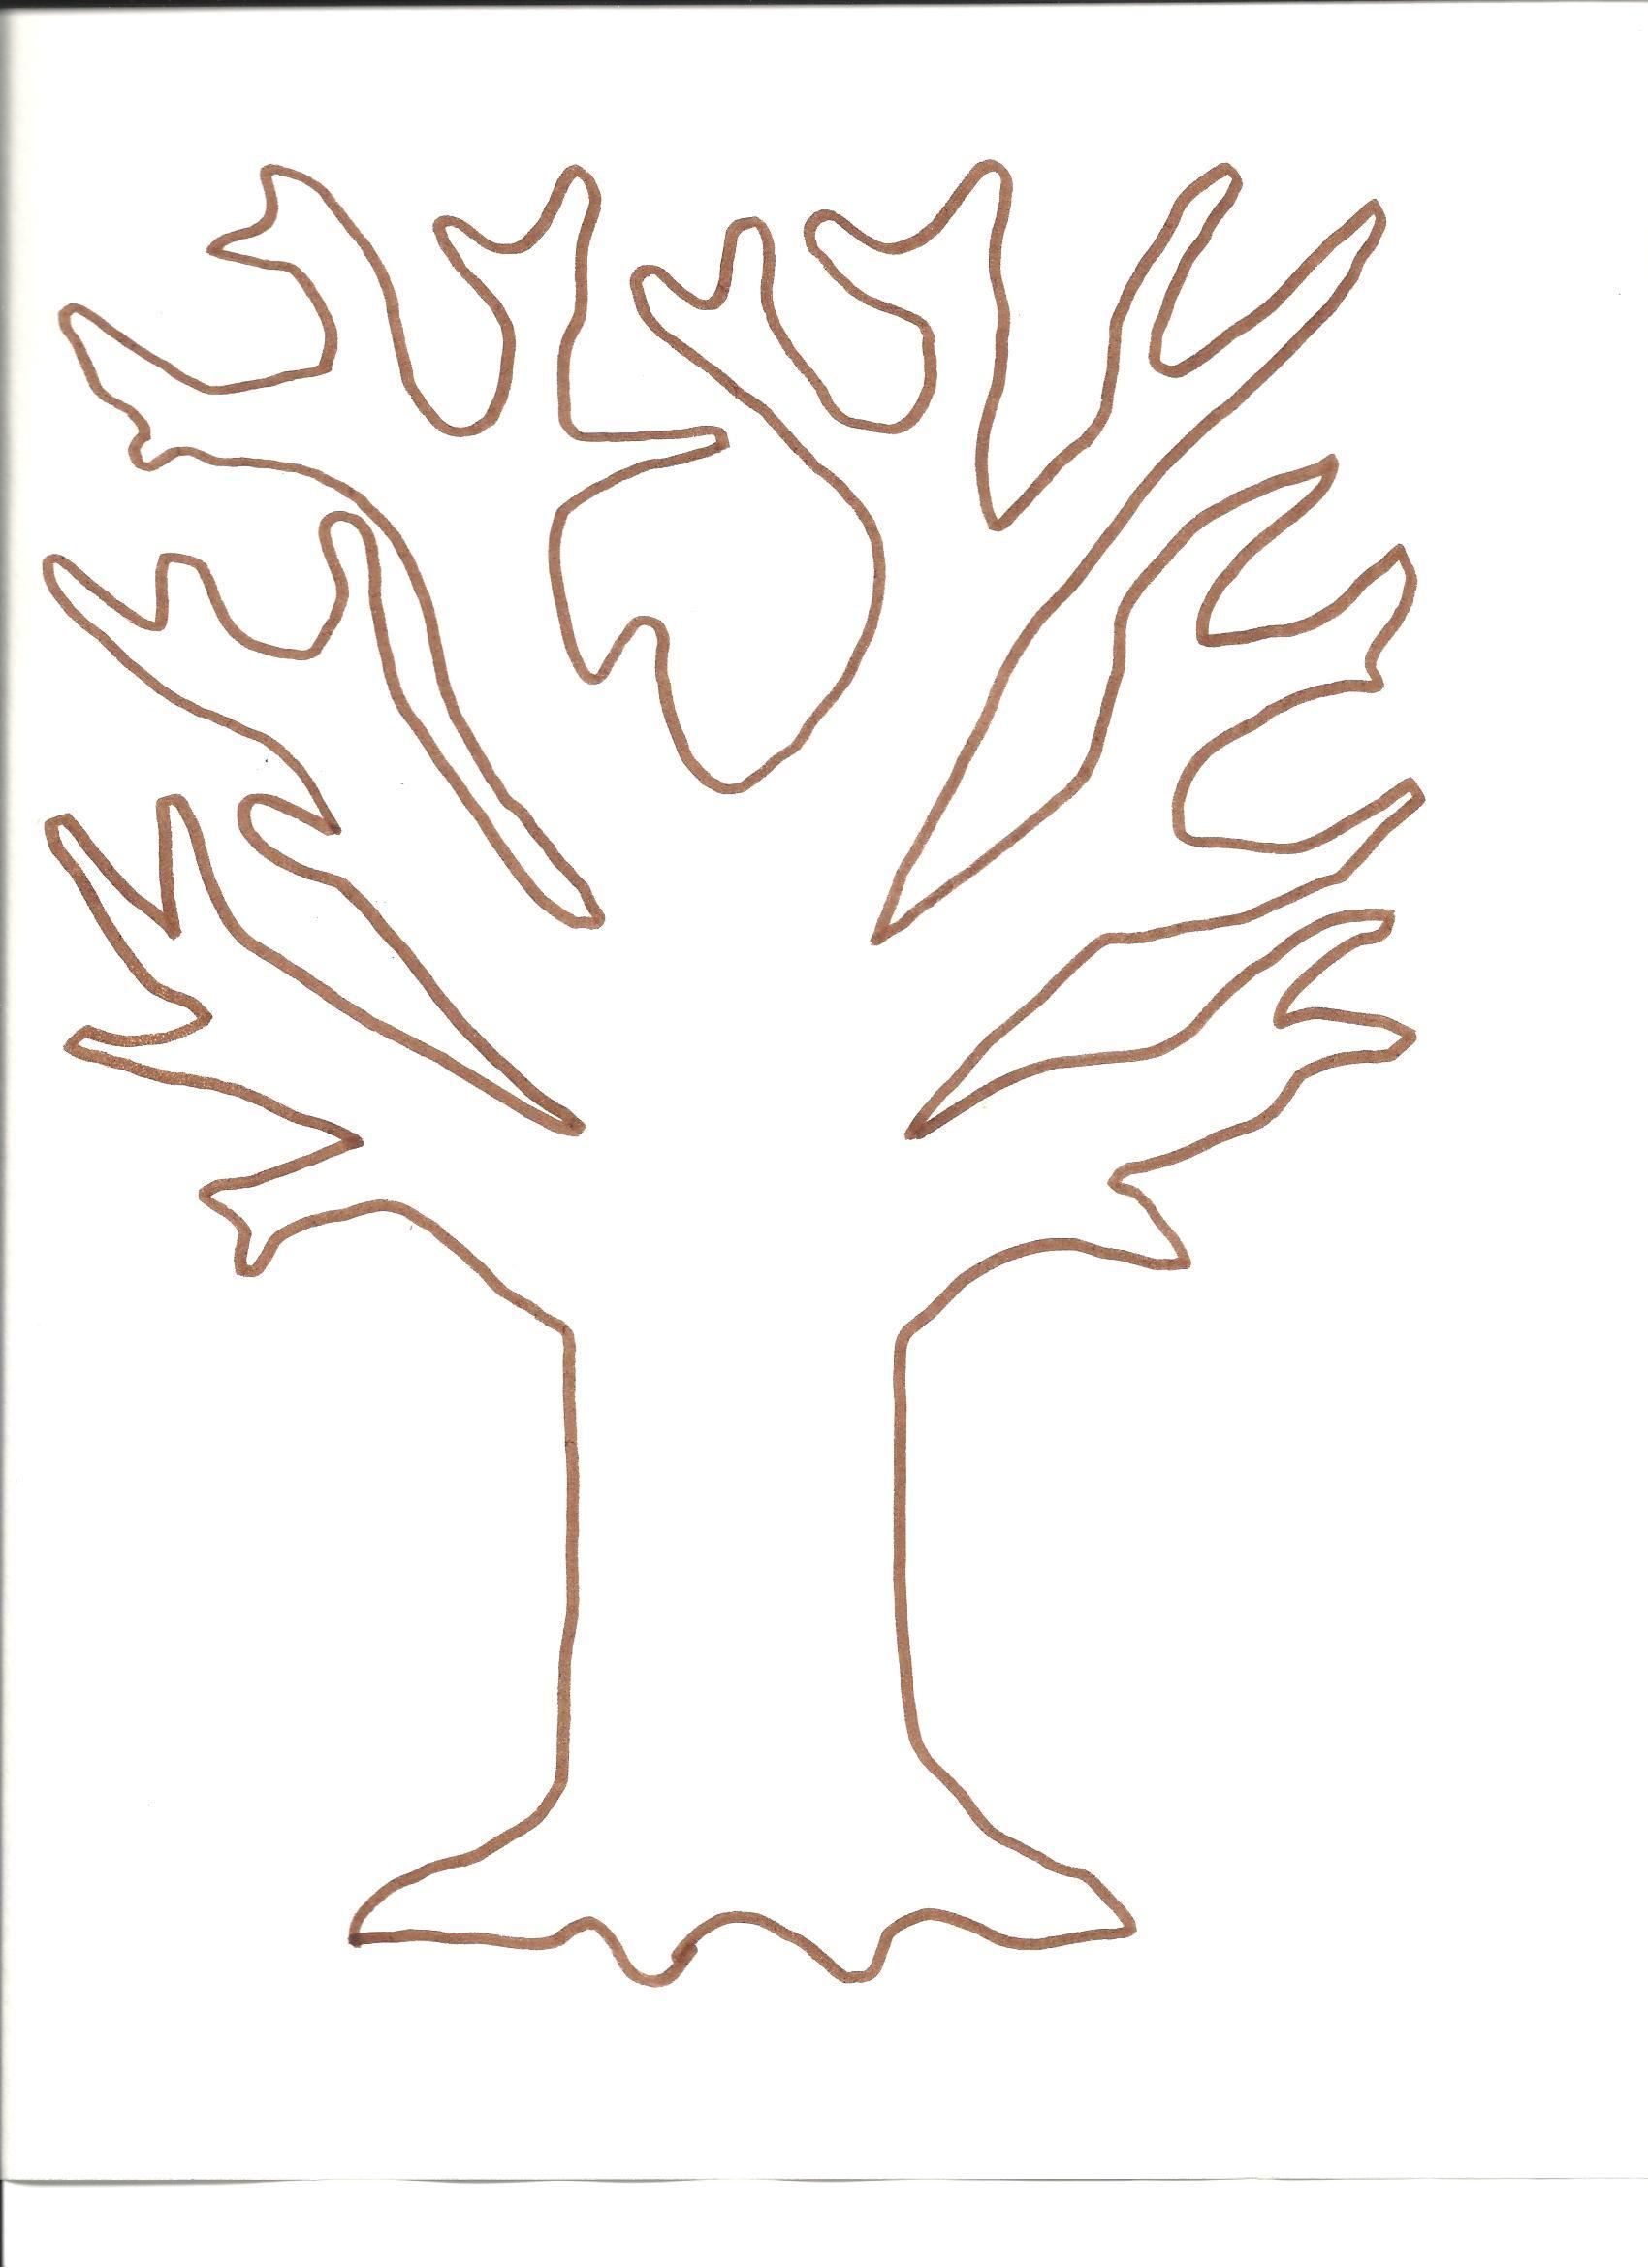 Pin By Anita B On Fk Bokrok Pinterest Fall Crafts Tree